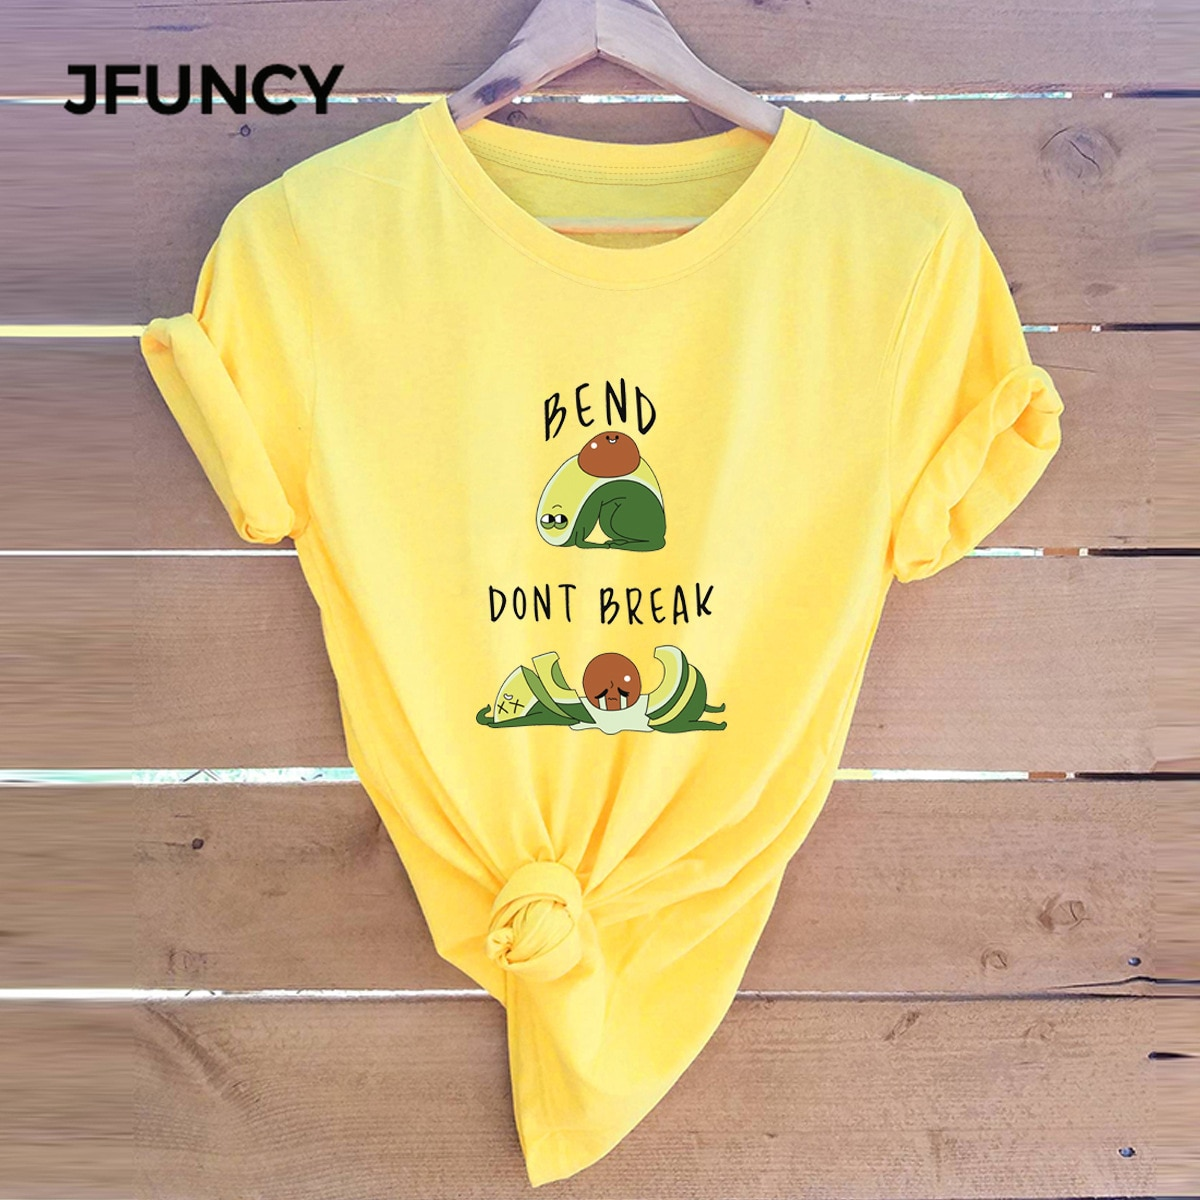 JFUNCY Nette Avocado Cartoon Gedruckt Baumwolle Sommer T-shirt Plus Größe Frauen T-shirt Casual Kurzarm Mujer Shirts Frau T Tops